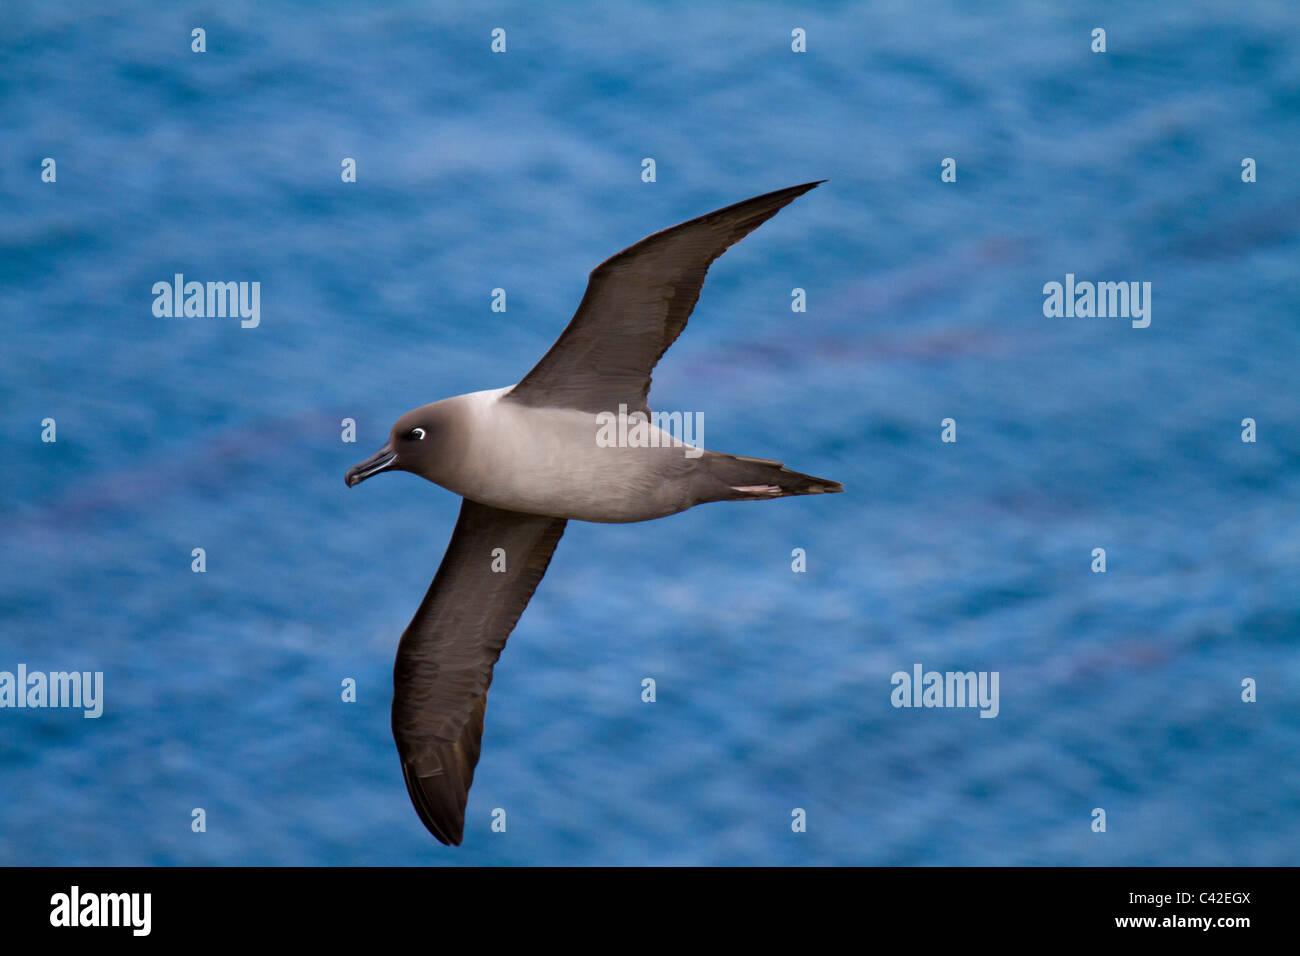 Light-mantled sooty albatross soars at eye leve, Elsehul, South Georgia Island - Stock Image